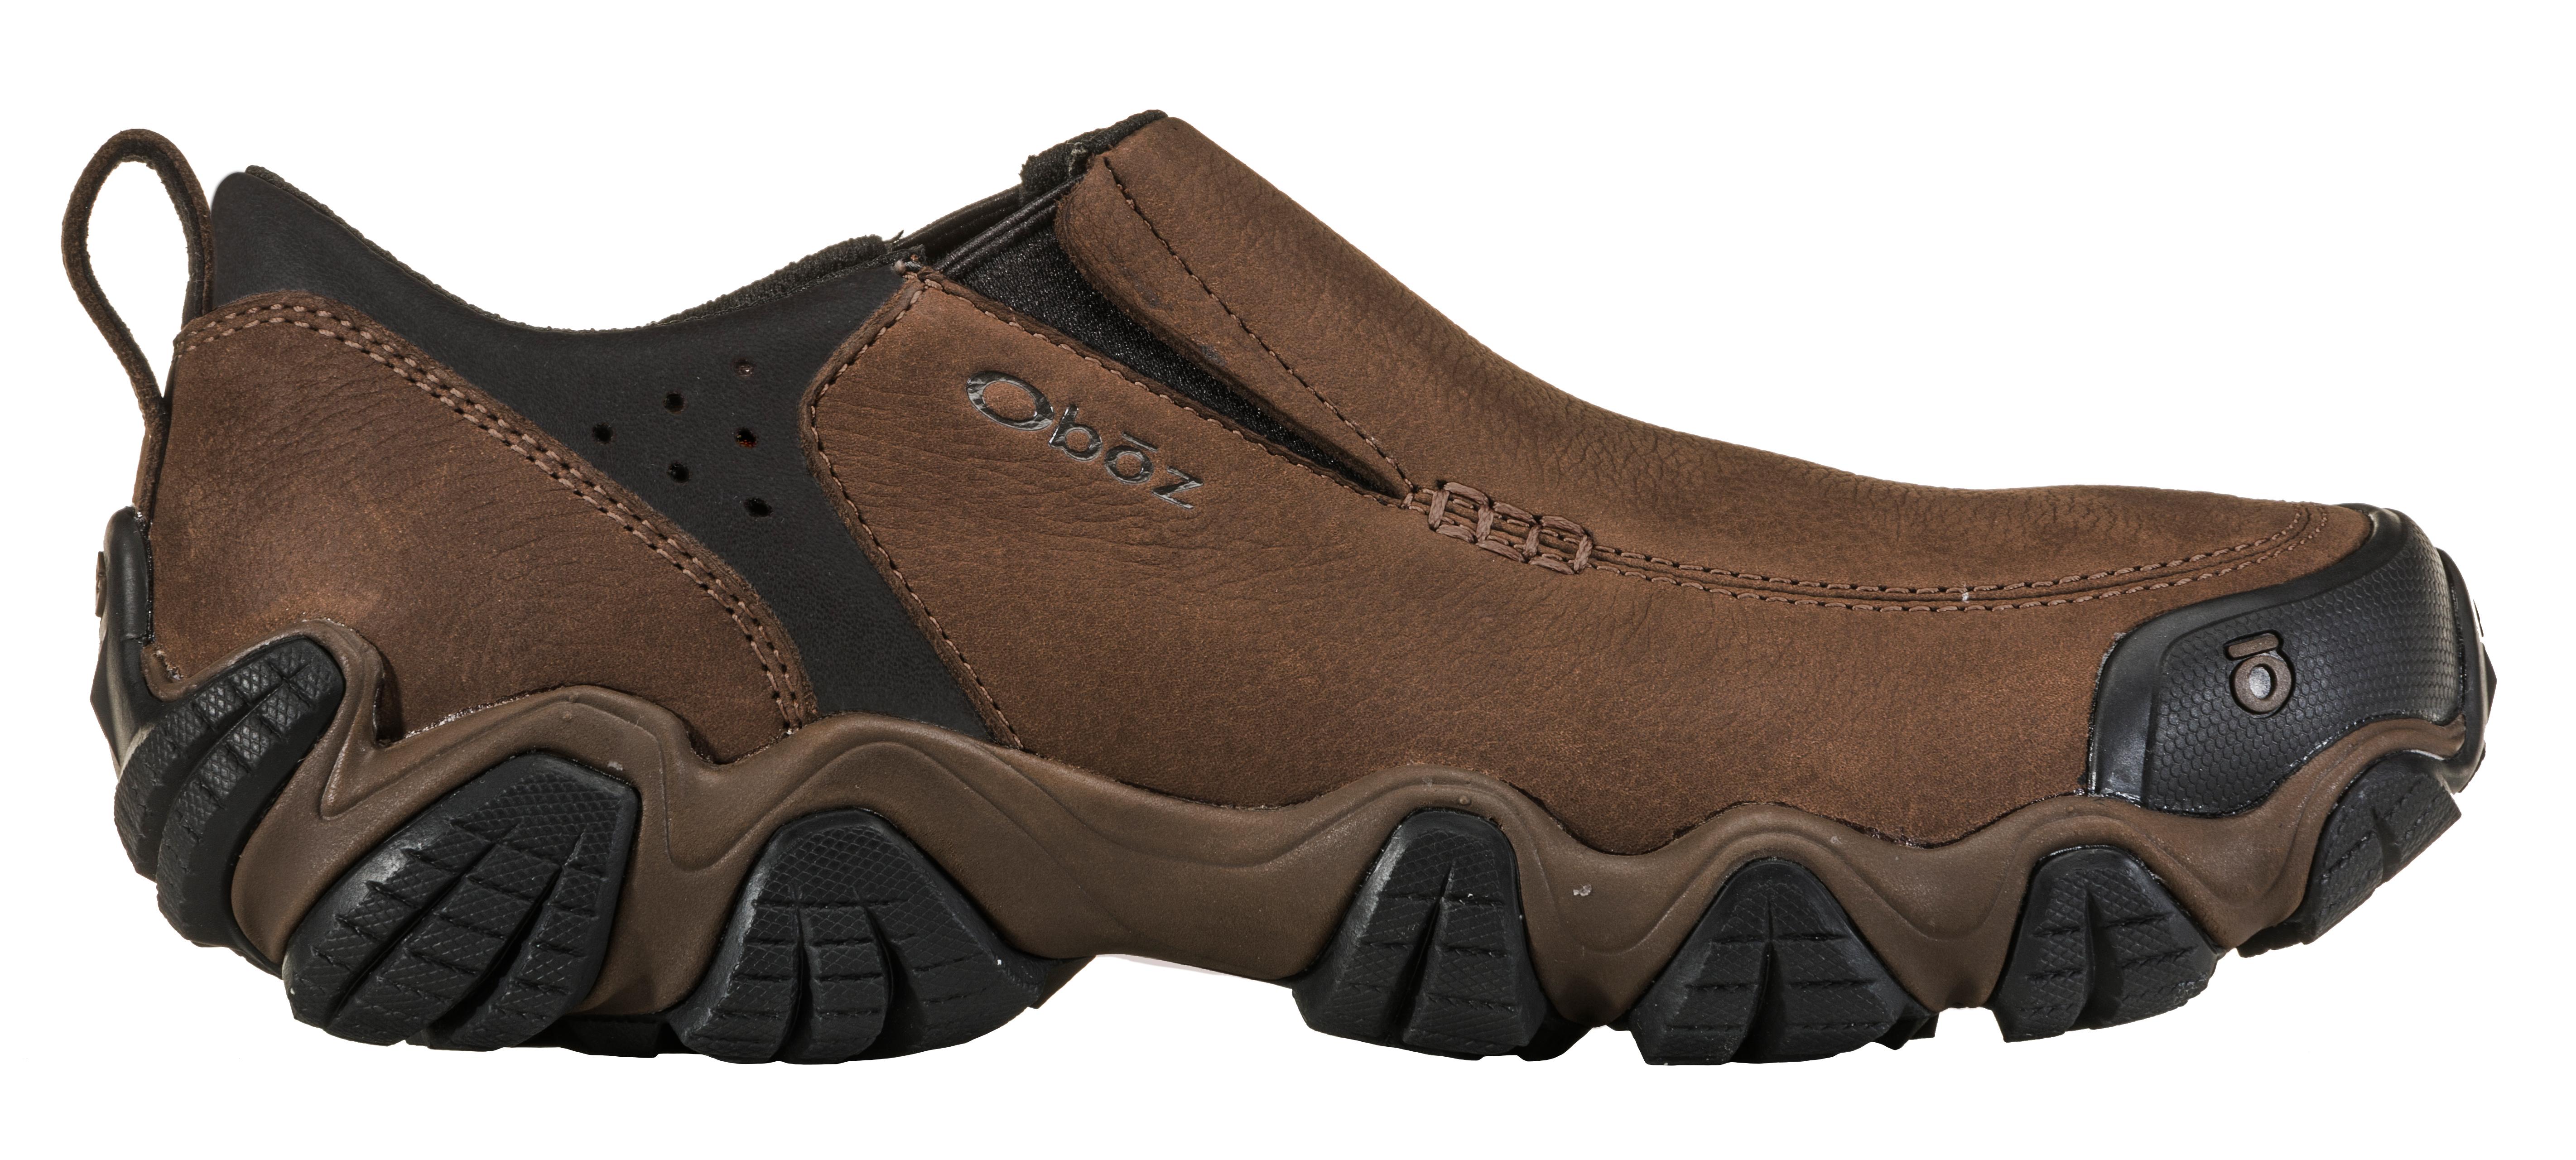 Oboz Livingston Low Slip On Shoes - Men